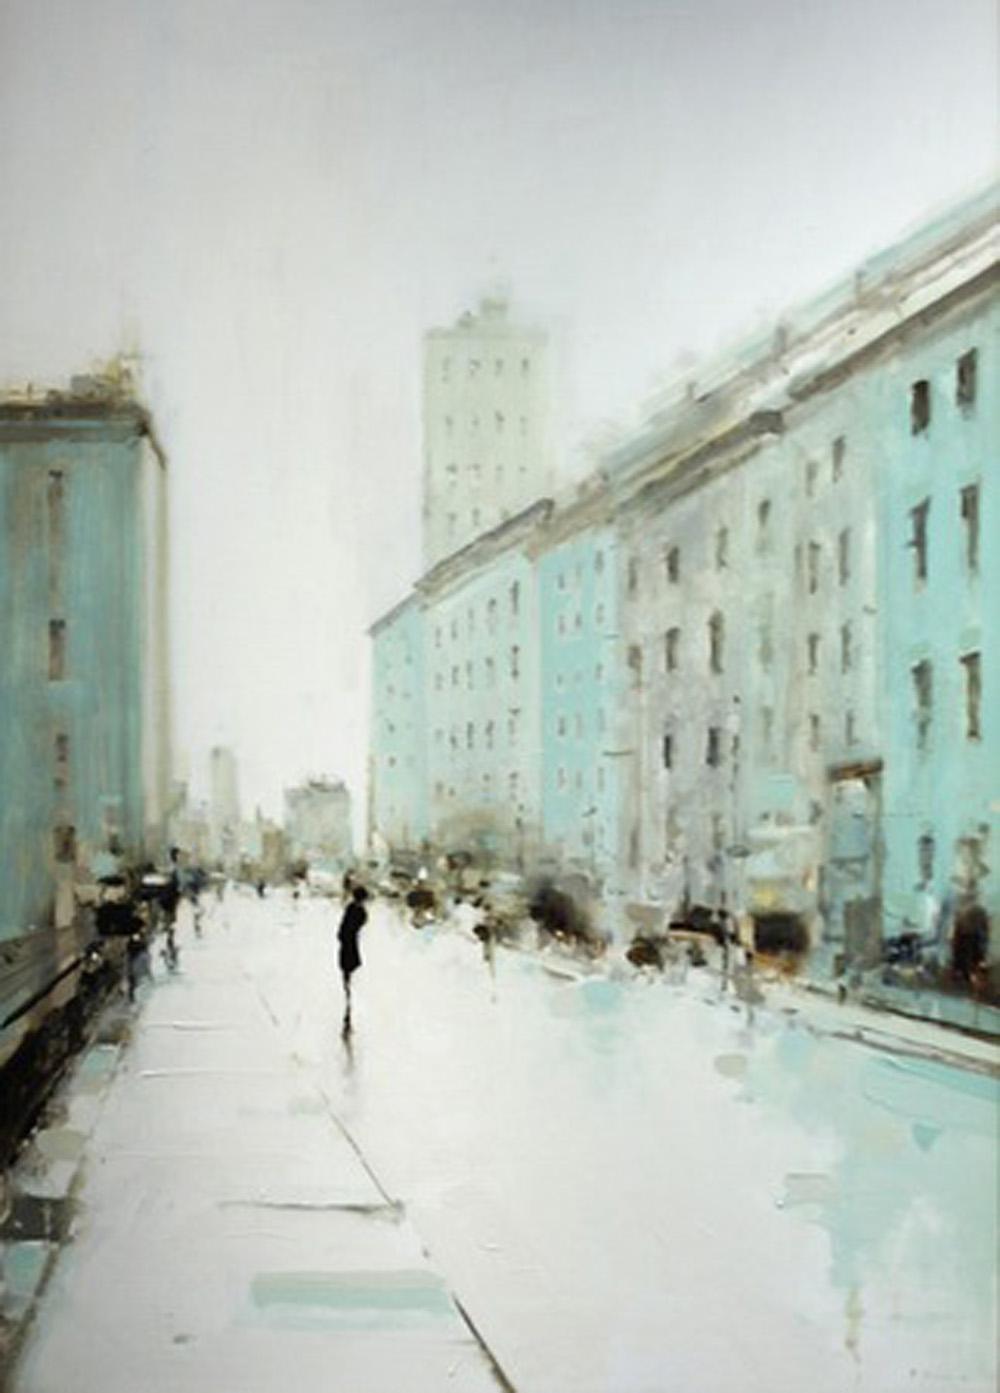 Geoffrey Johnson, City Buildings Green, oil on wood panel, 2013 via  Hubert Gallery